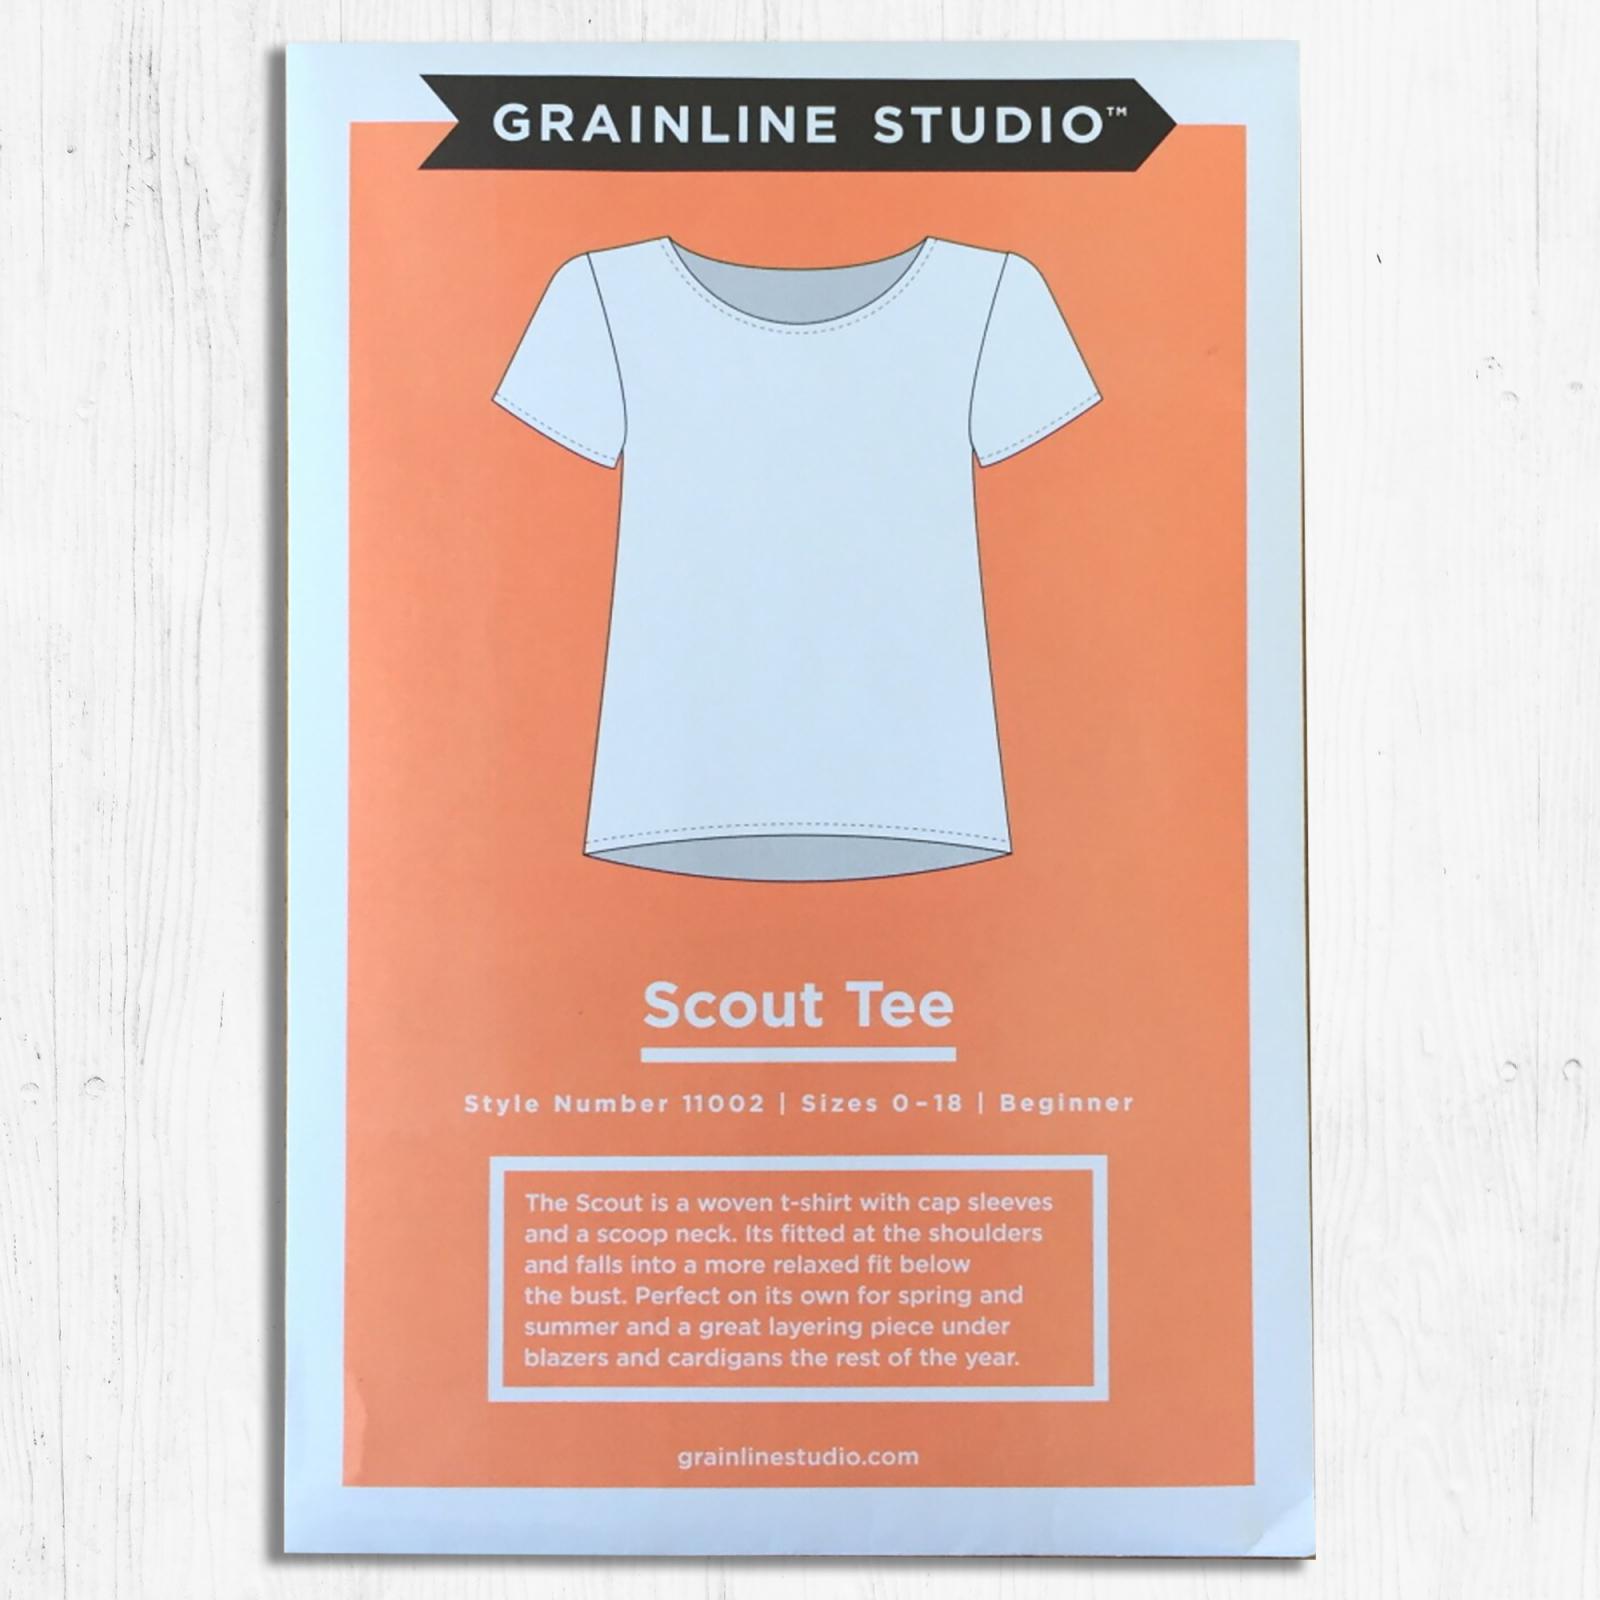 Grainline Studios - Scout Tee - Sizes 14-30